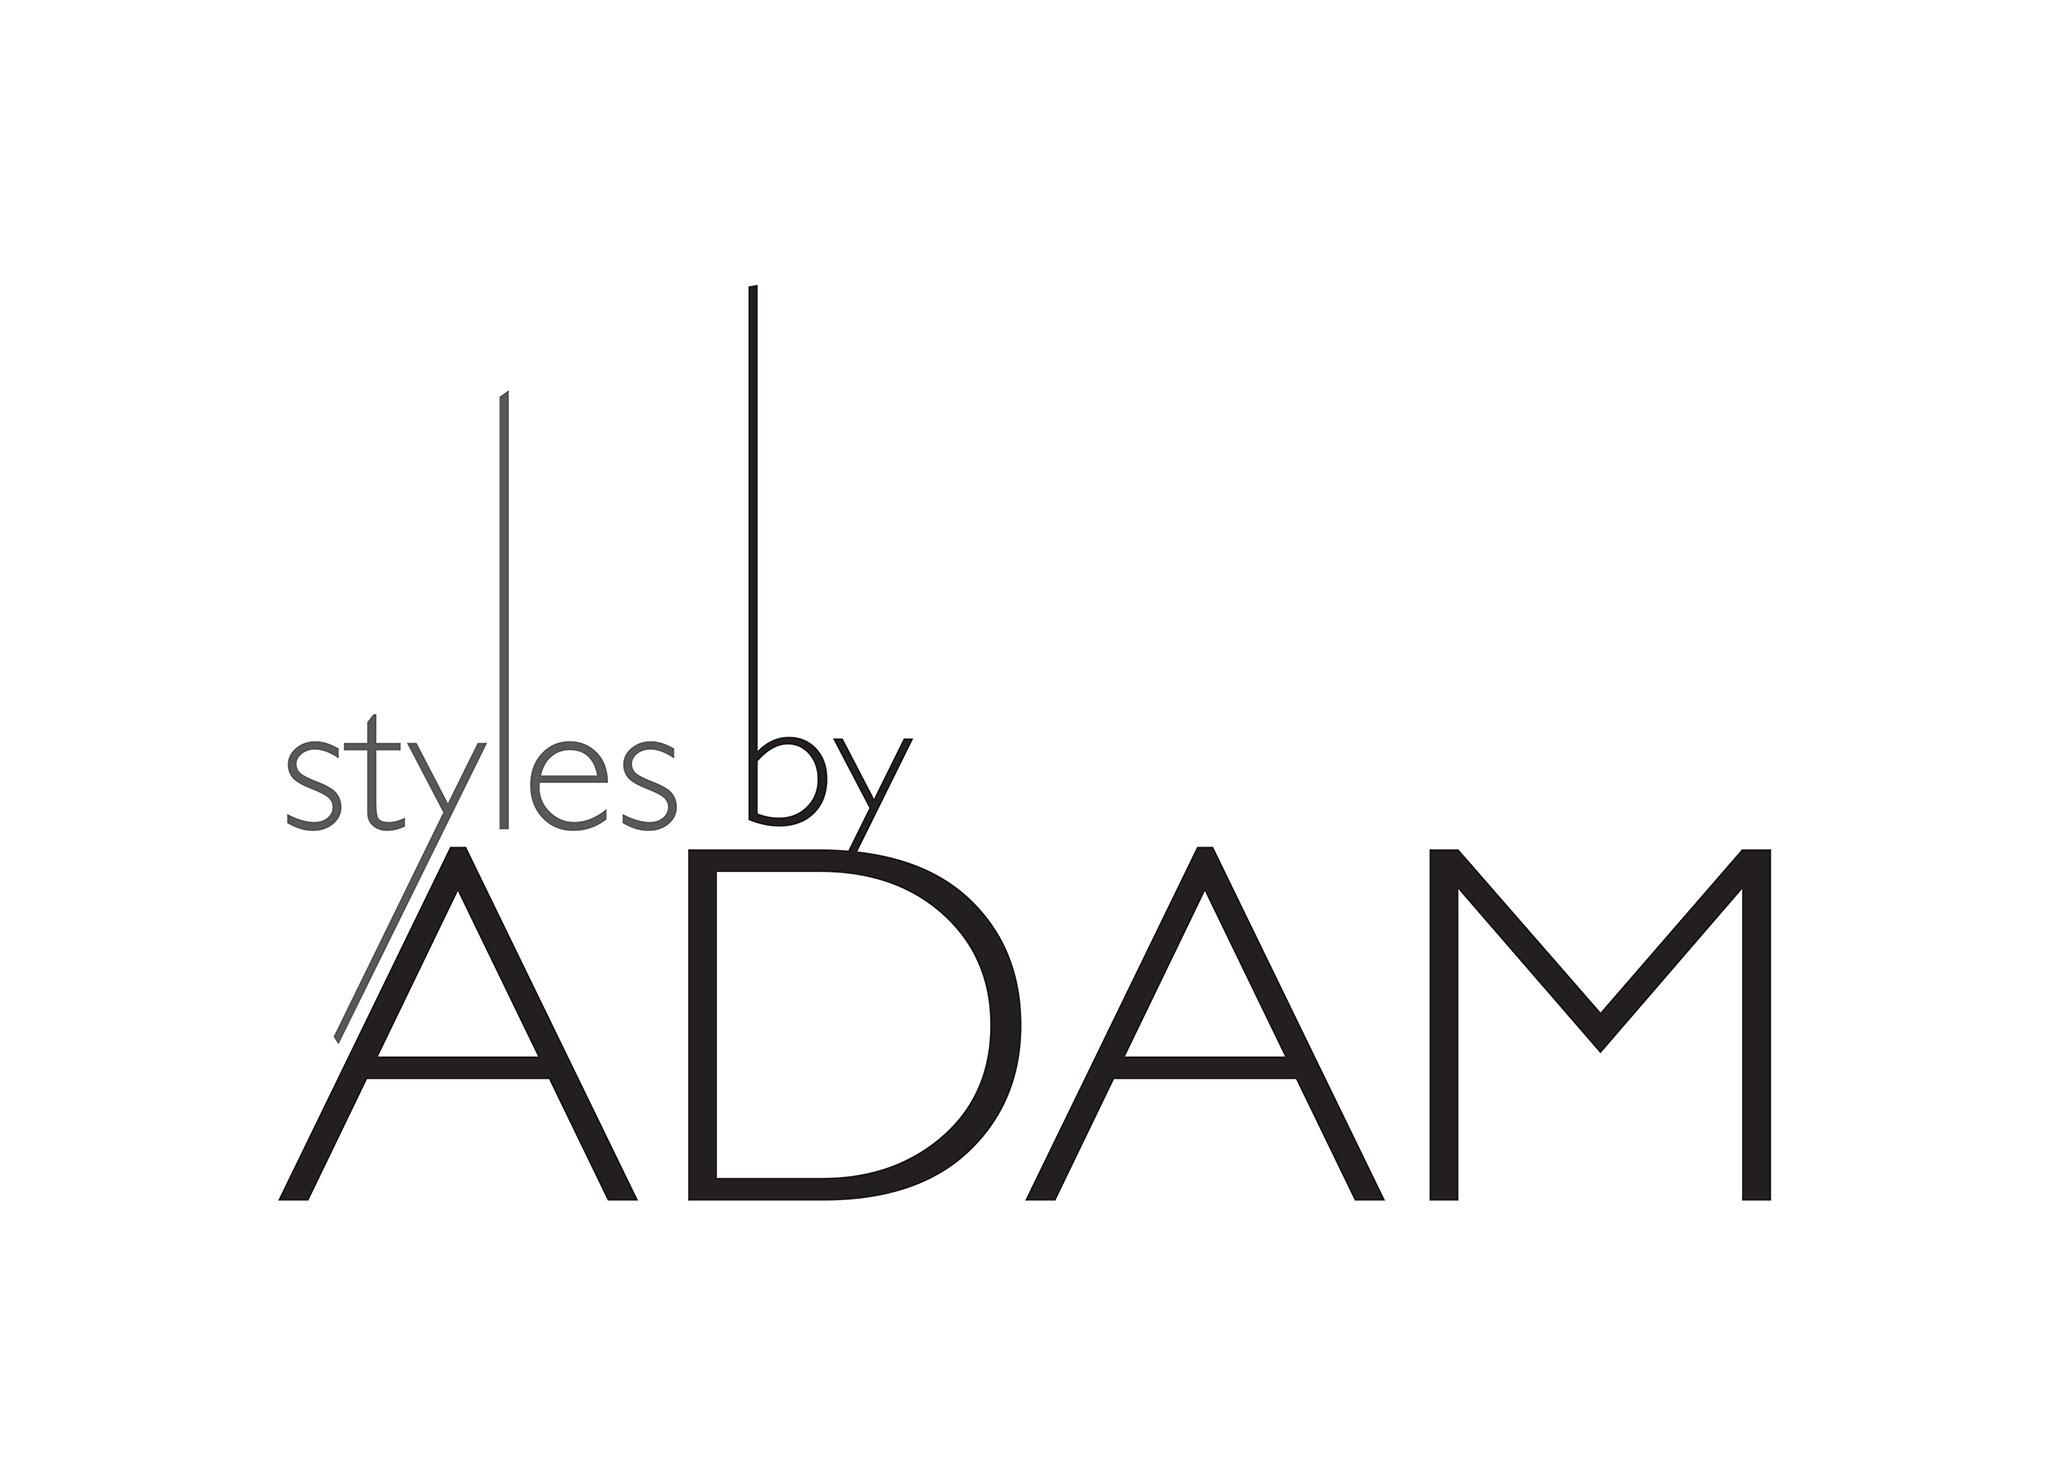 Styles by ADAM - logo design